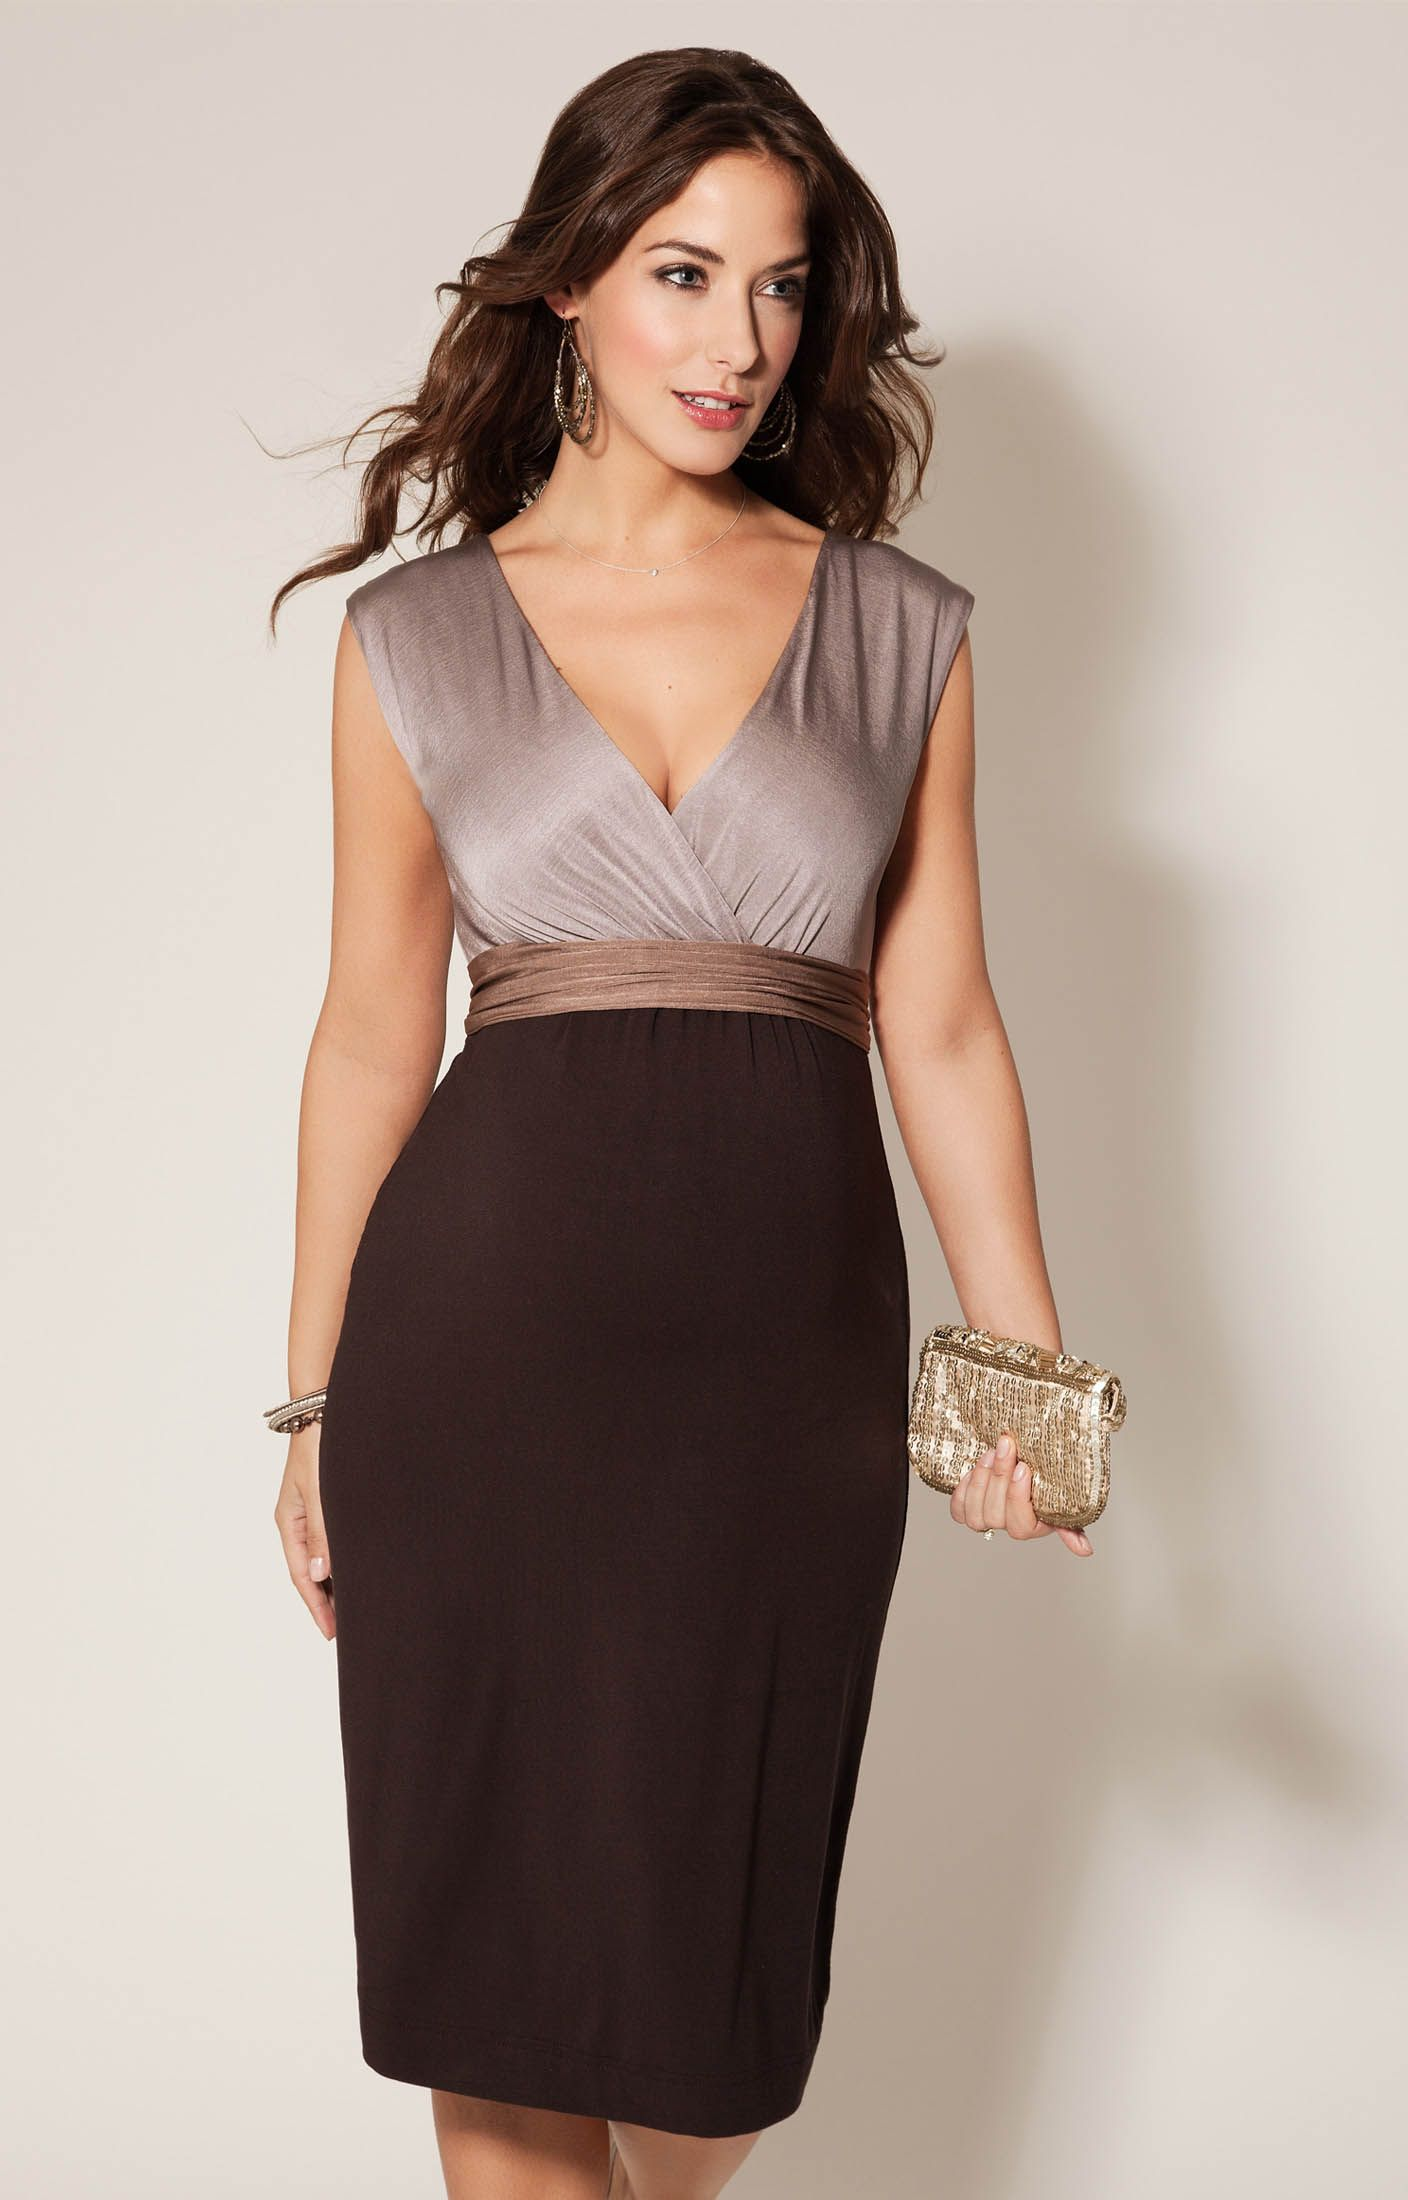 Jewel Block Dress | Maternity dresses, Tiffany rose and Jewel